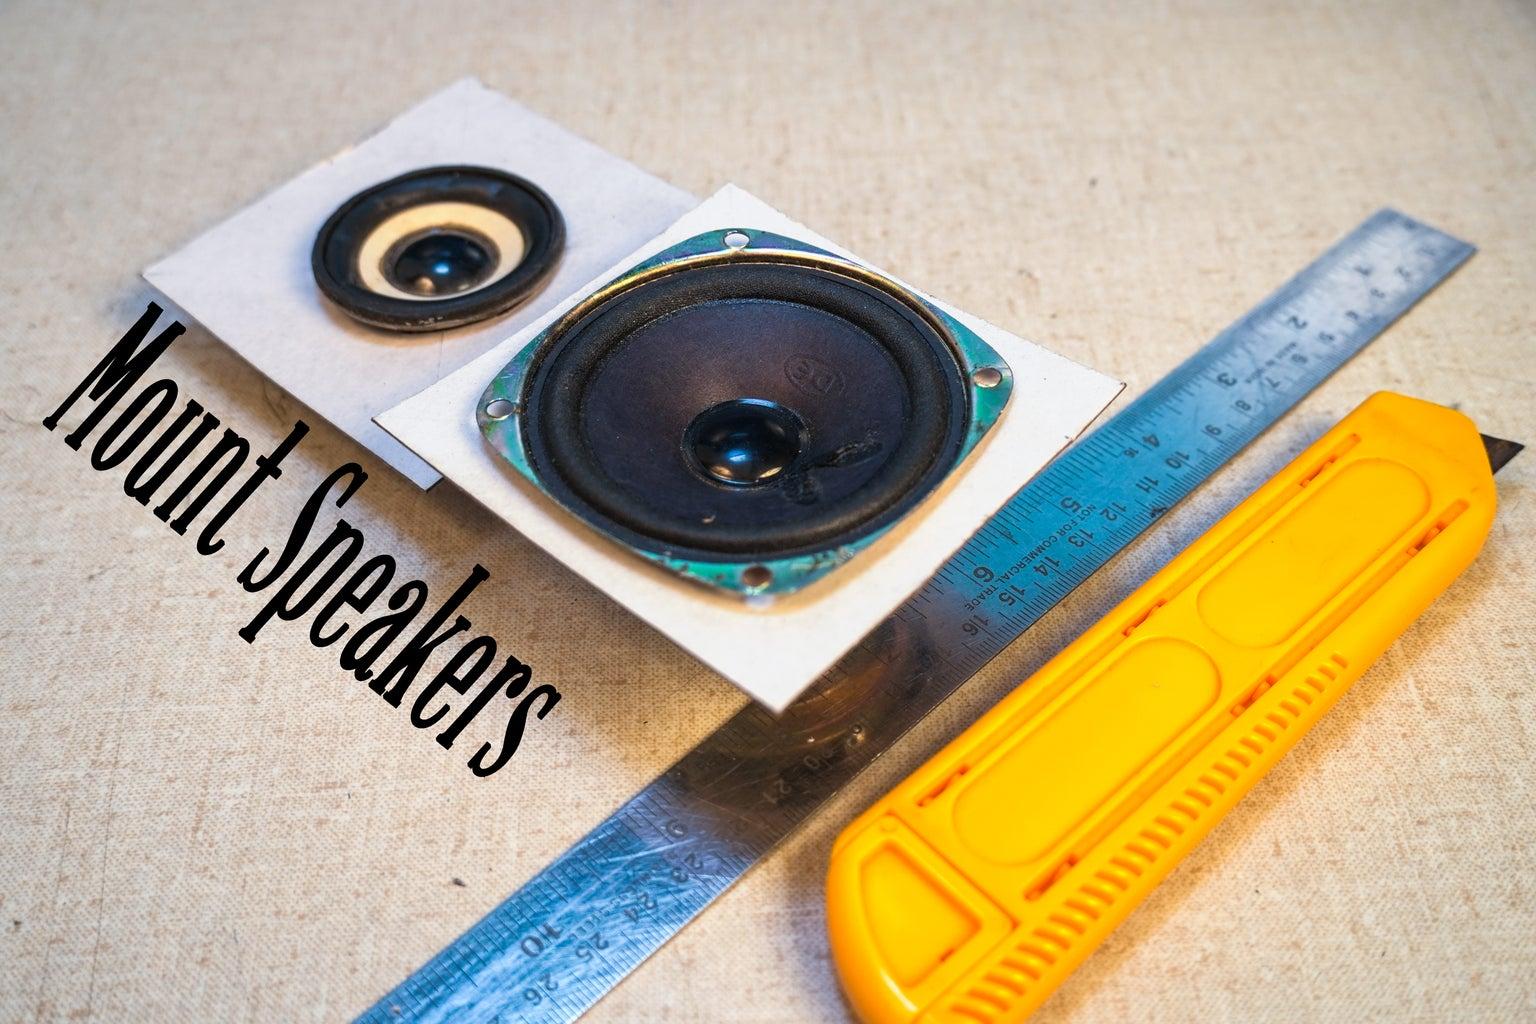 Cut Out Cardboard for Speaker Mount